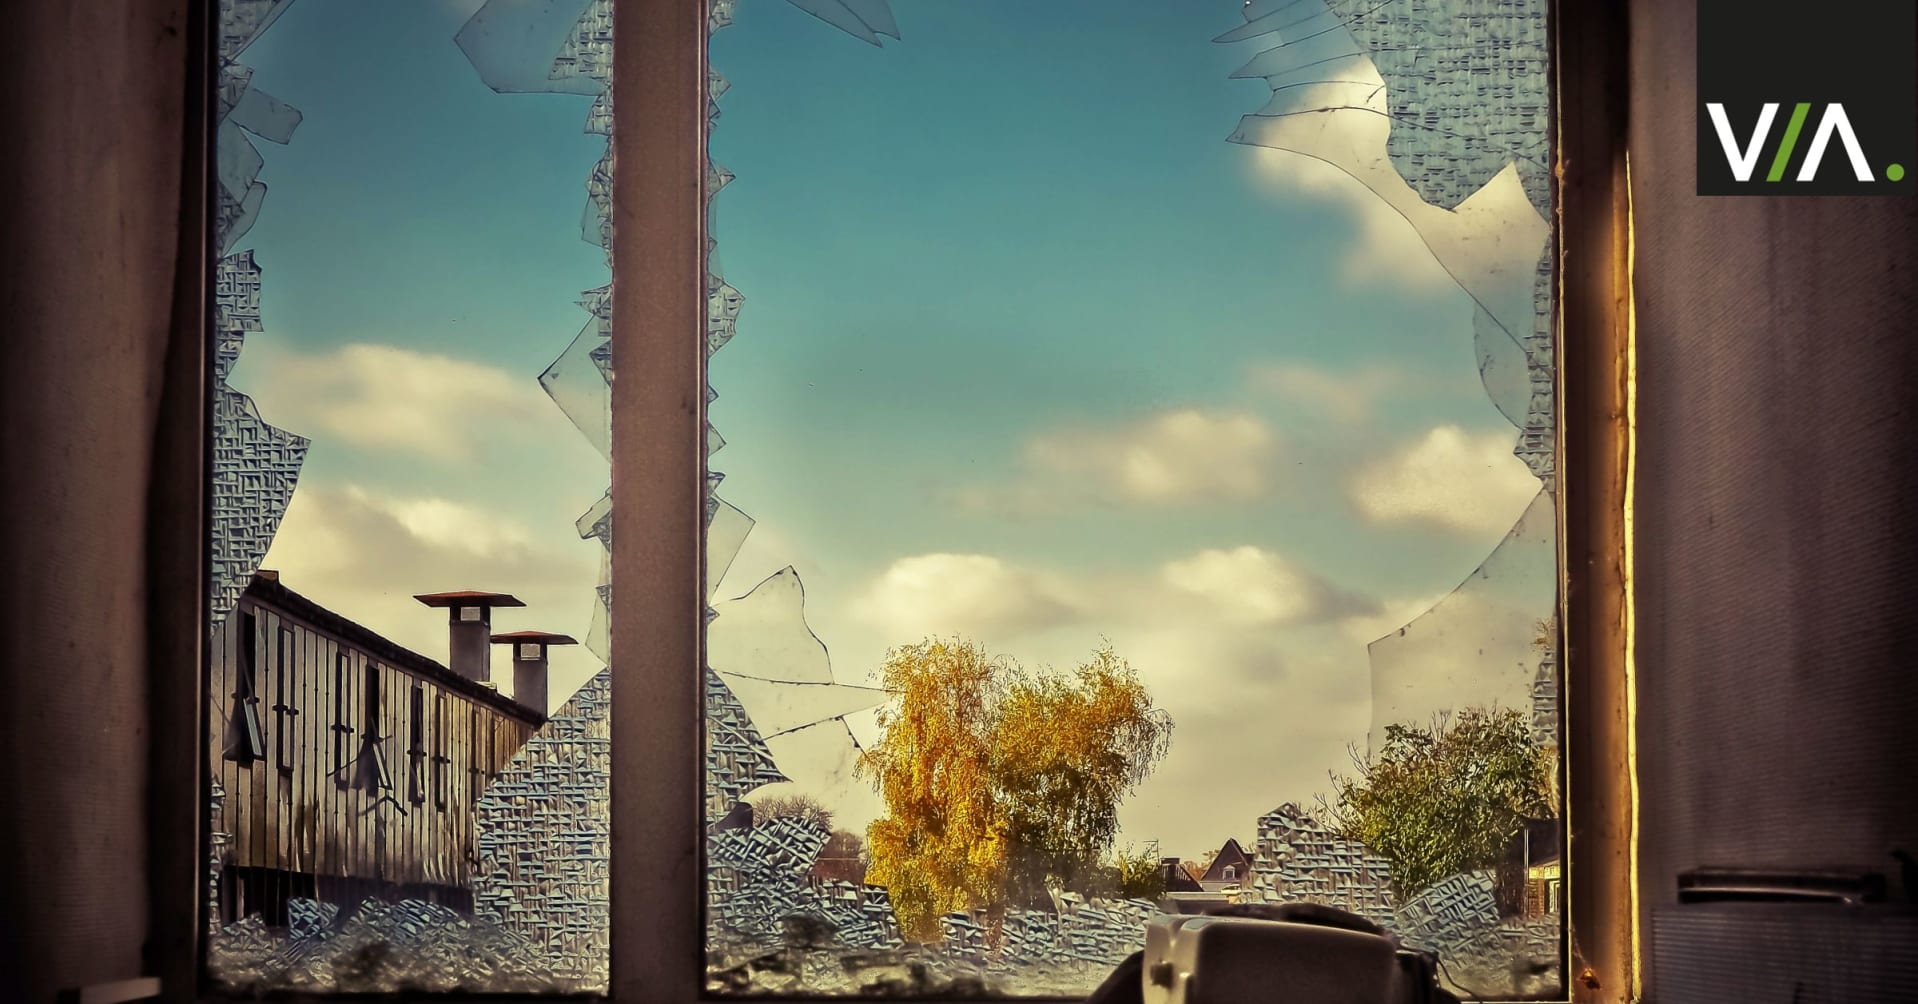 Síndrome de la ventana rota